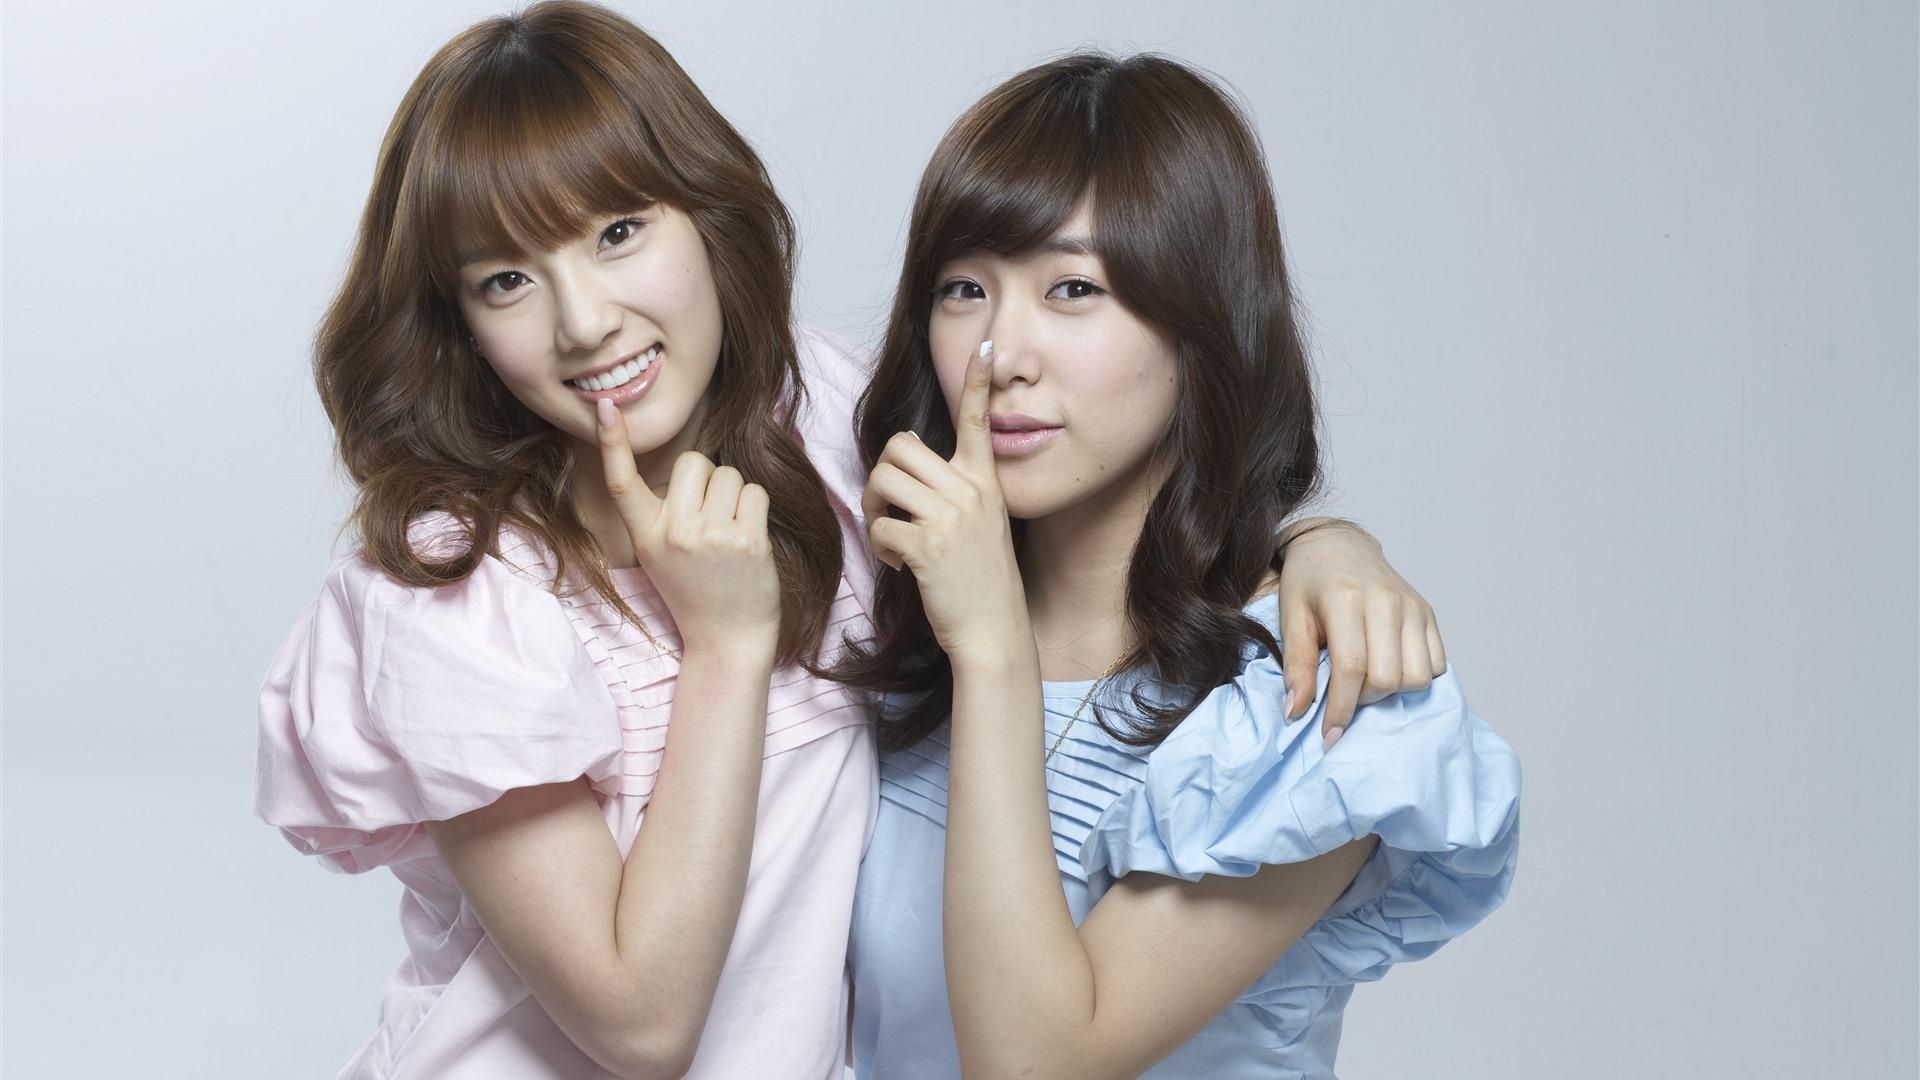 Wallpaper SNSD, two korean girls 5120x2880 UHD 5K Picture, Image